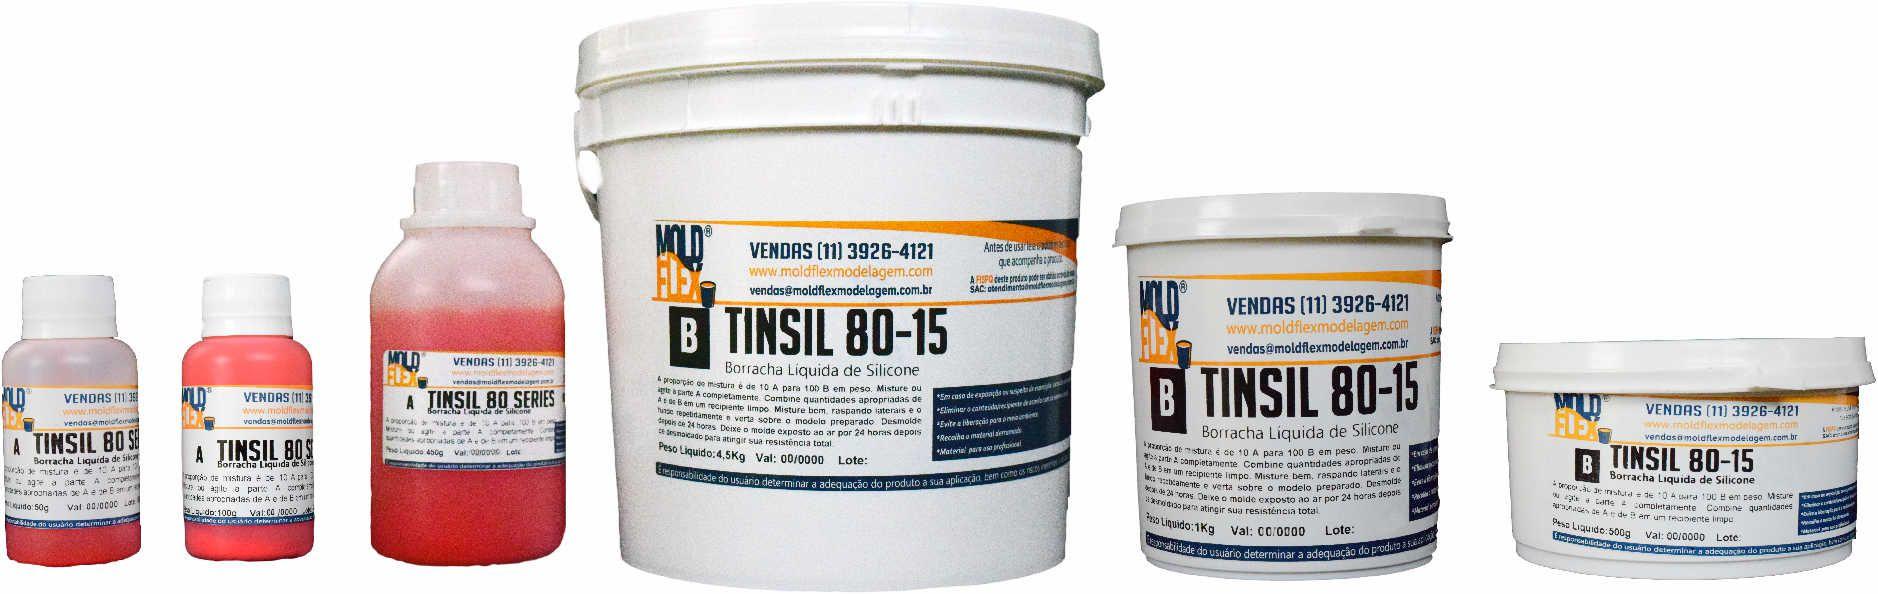 TinSil 80-15 -  Silicone Líquido